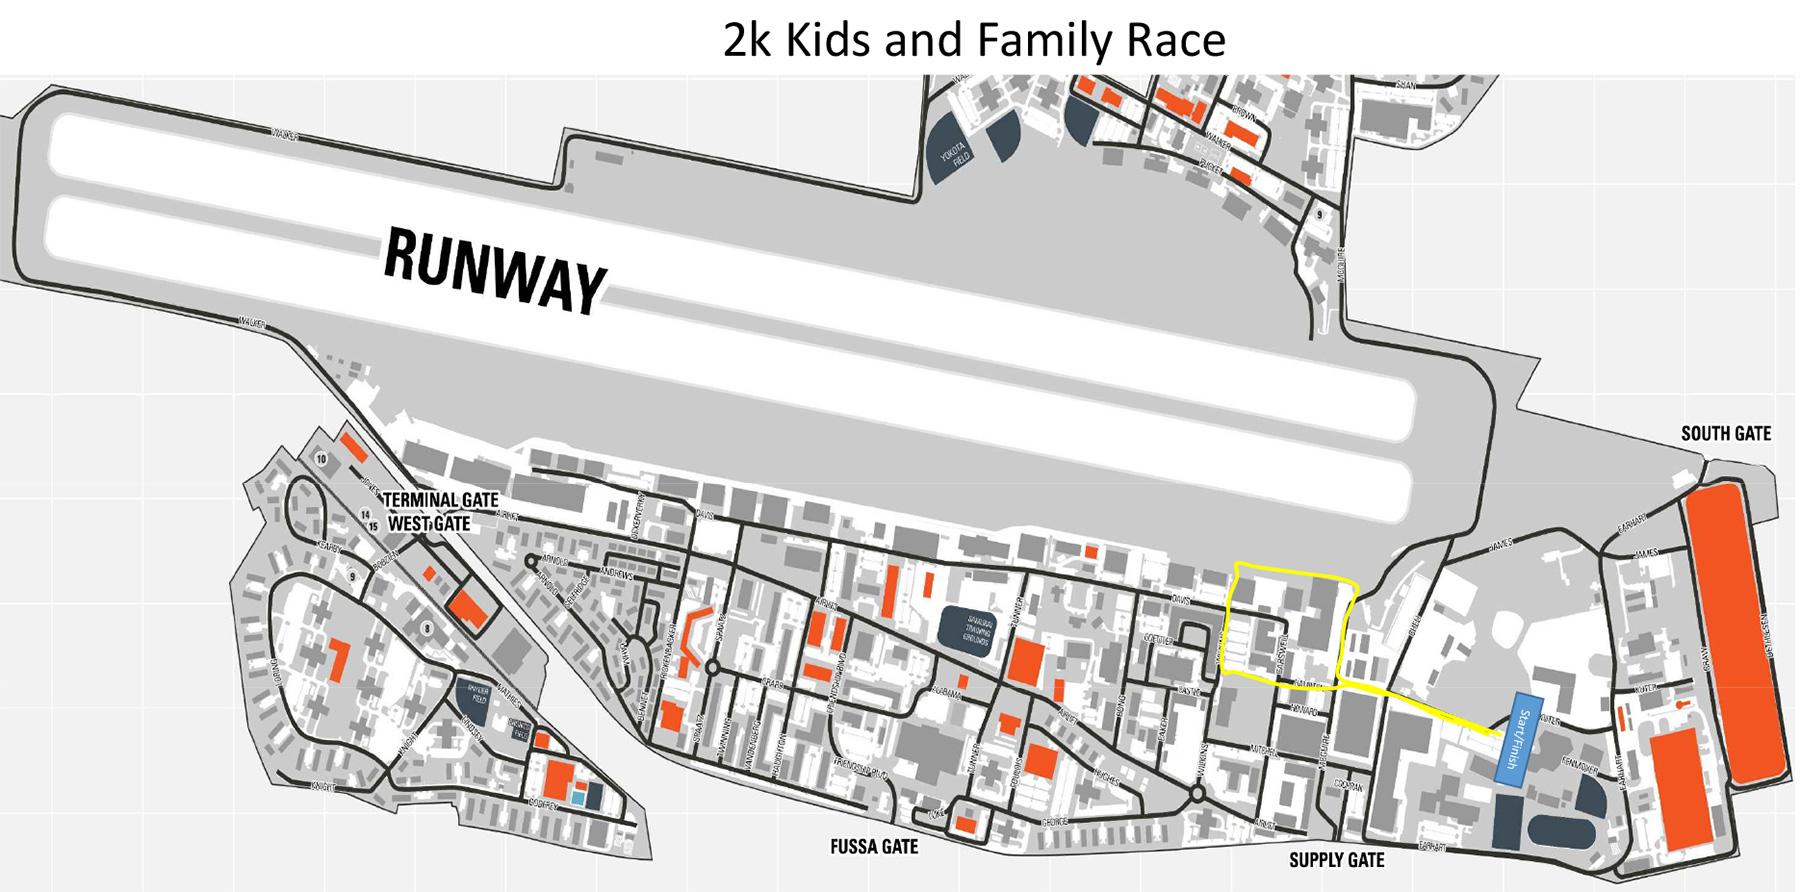 2kmキッズラン・ファミリーマラソンコースマップ